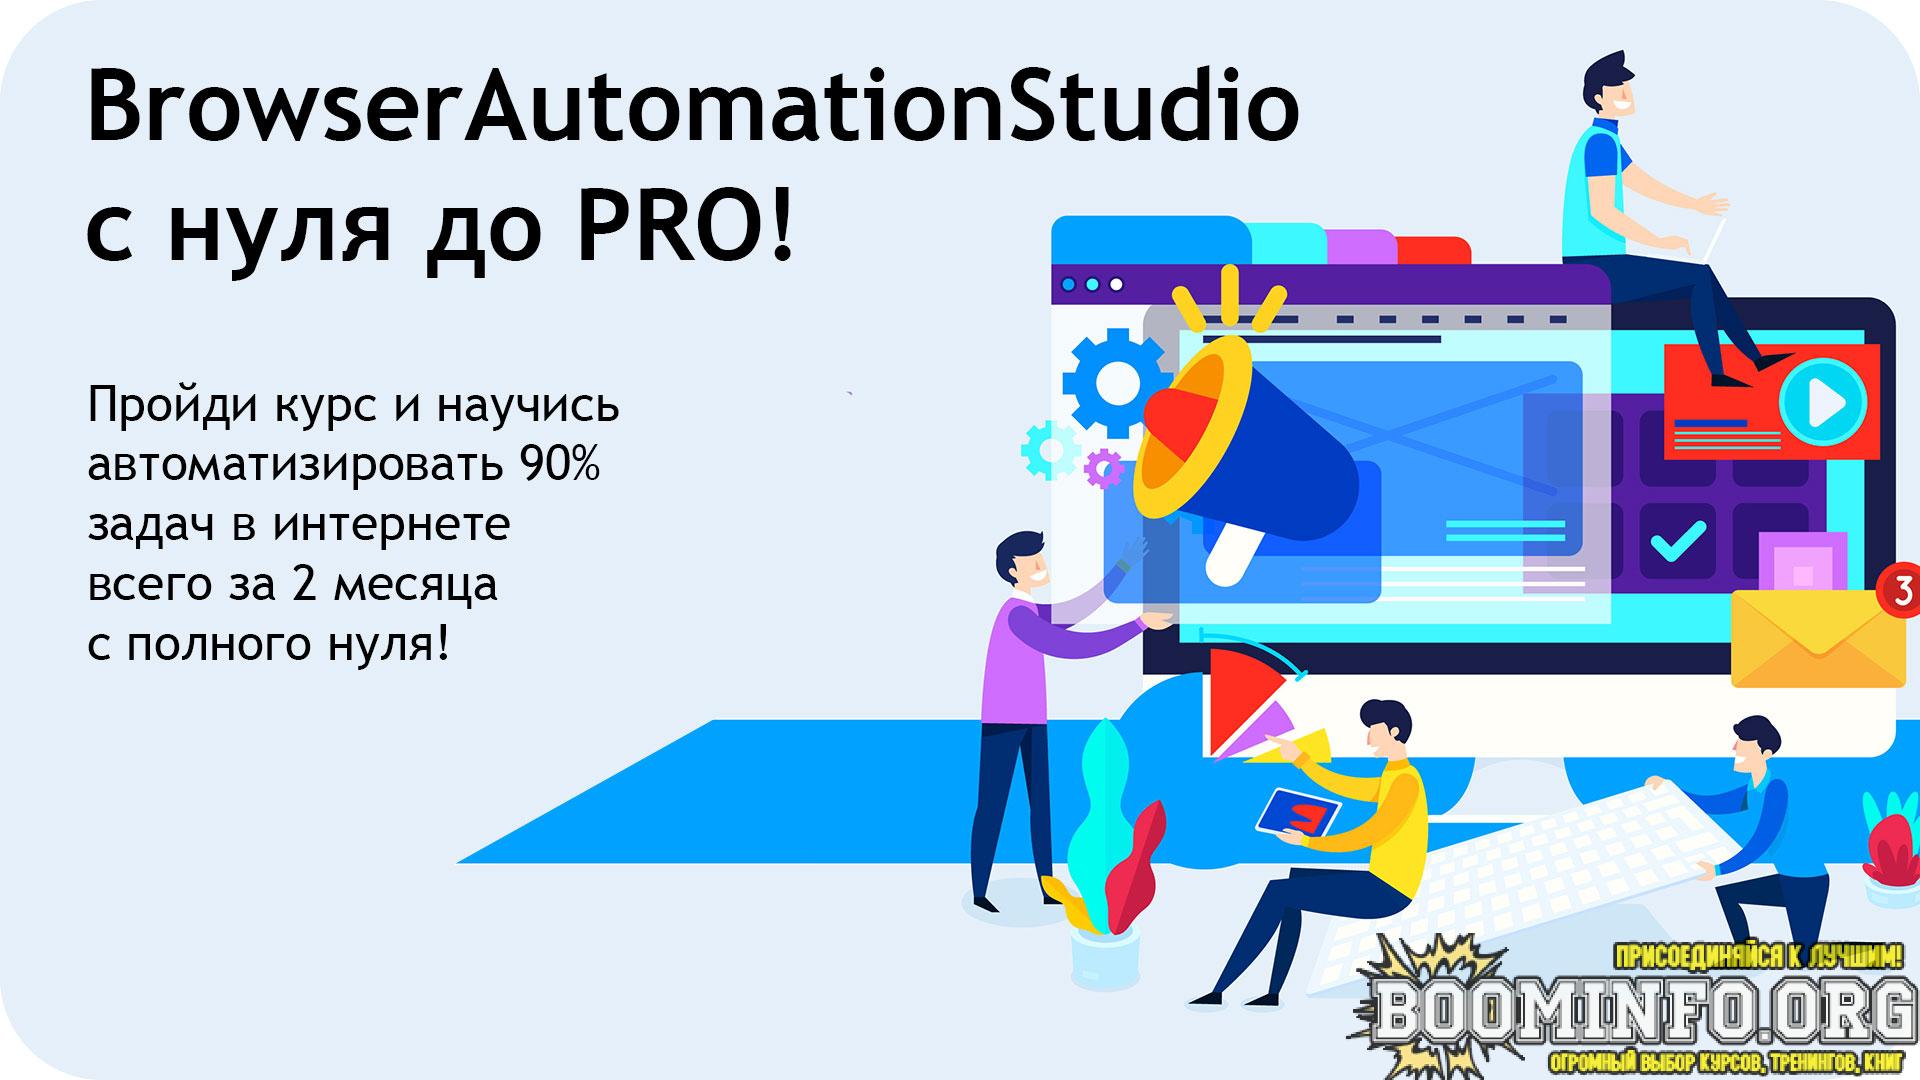 Browser-Automation-Studio-PRO-2021.jpg